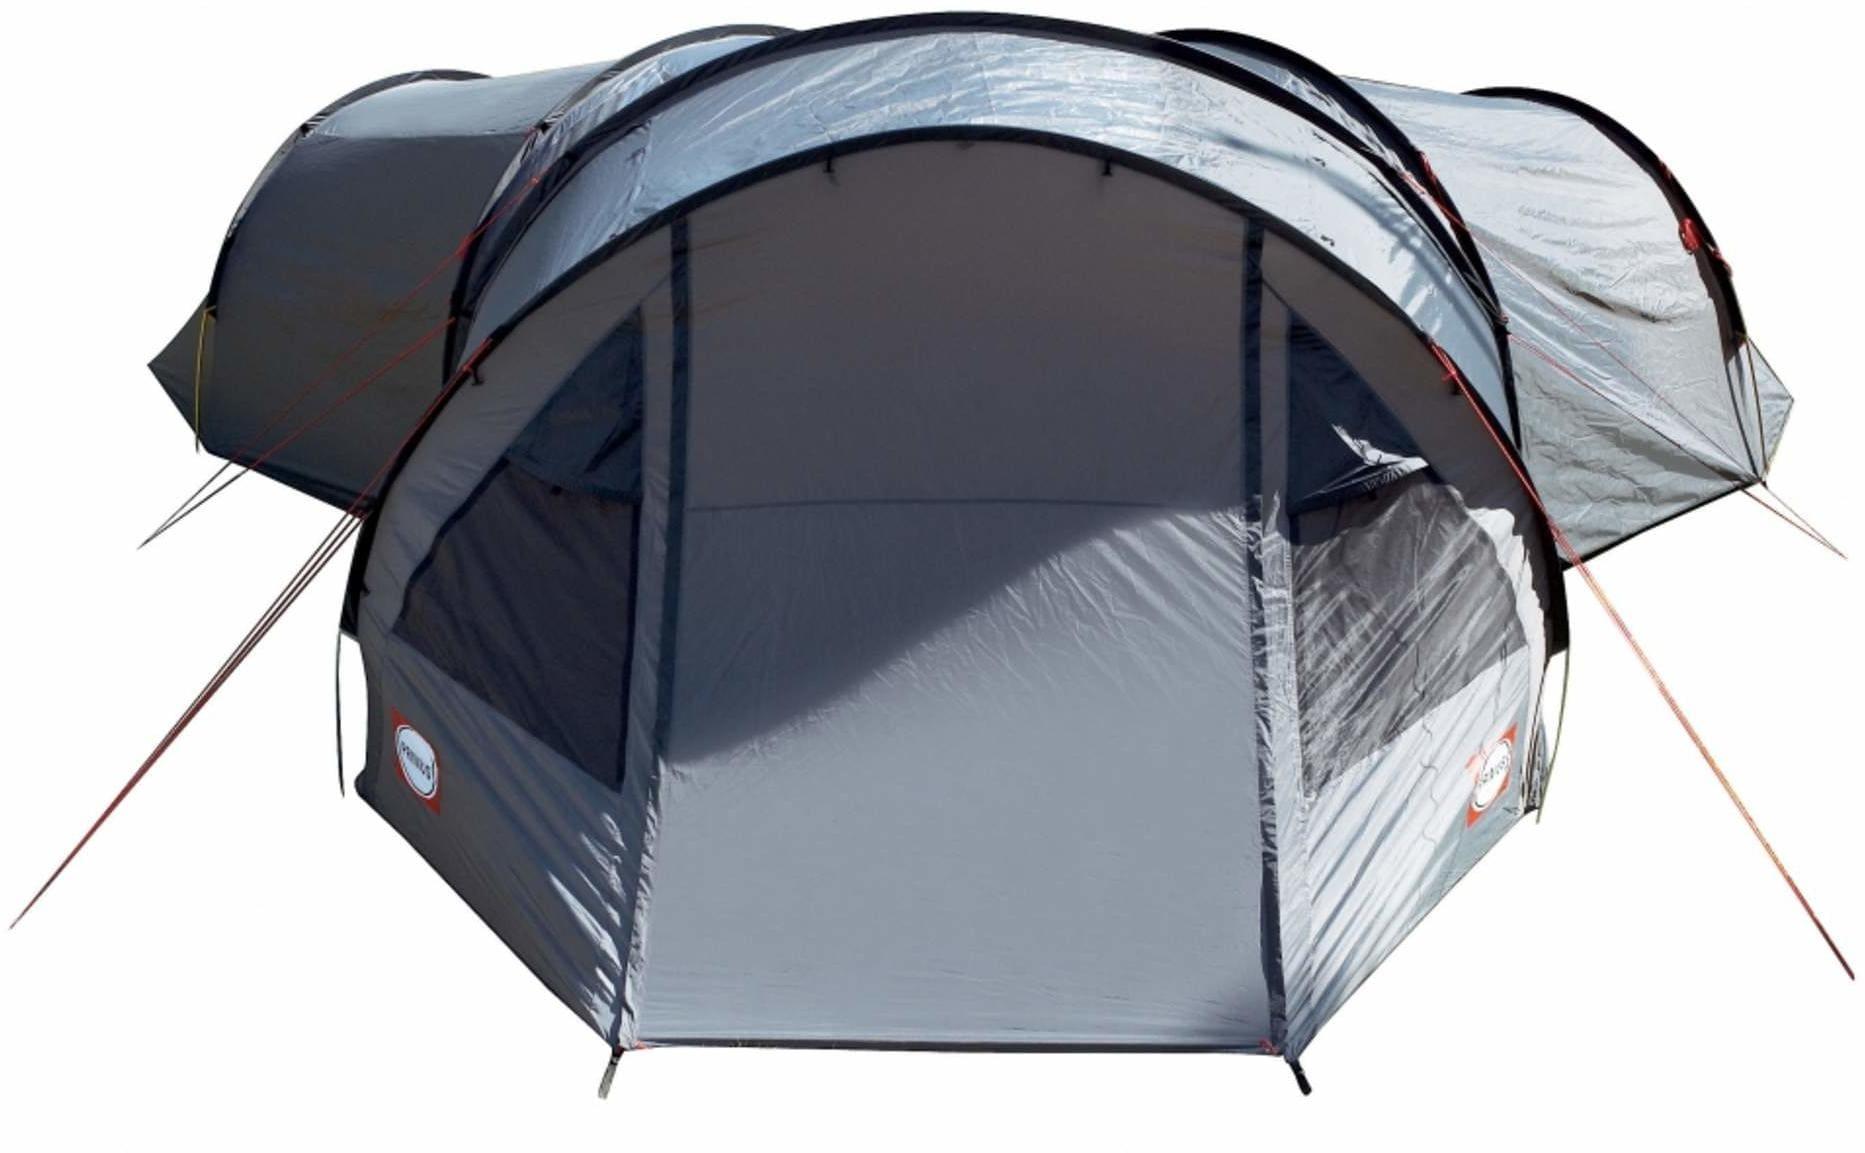 primus bifrost y6 tunnelzelt 6 personen grau von primus bei camping wagner campingzubeh r. Black Bedroom Furniture Sets. Home Design Ideas